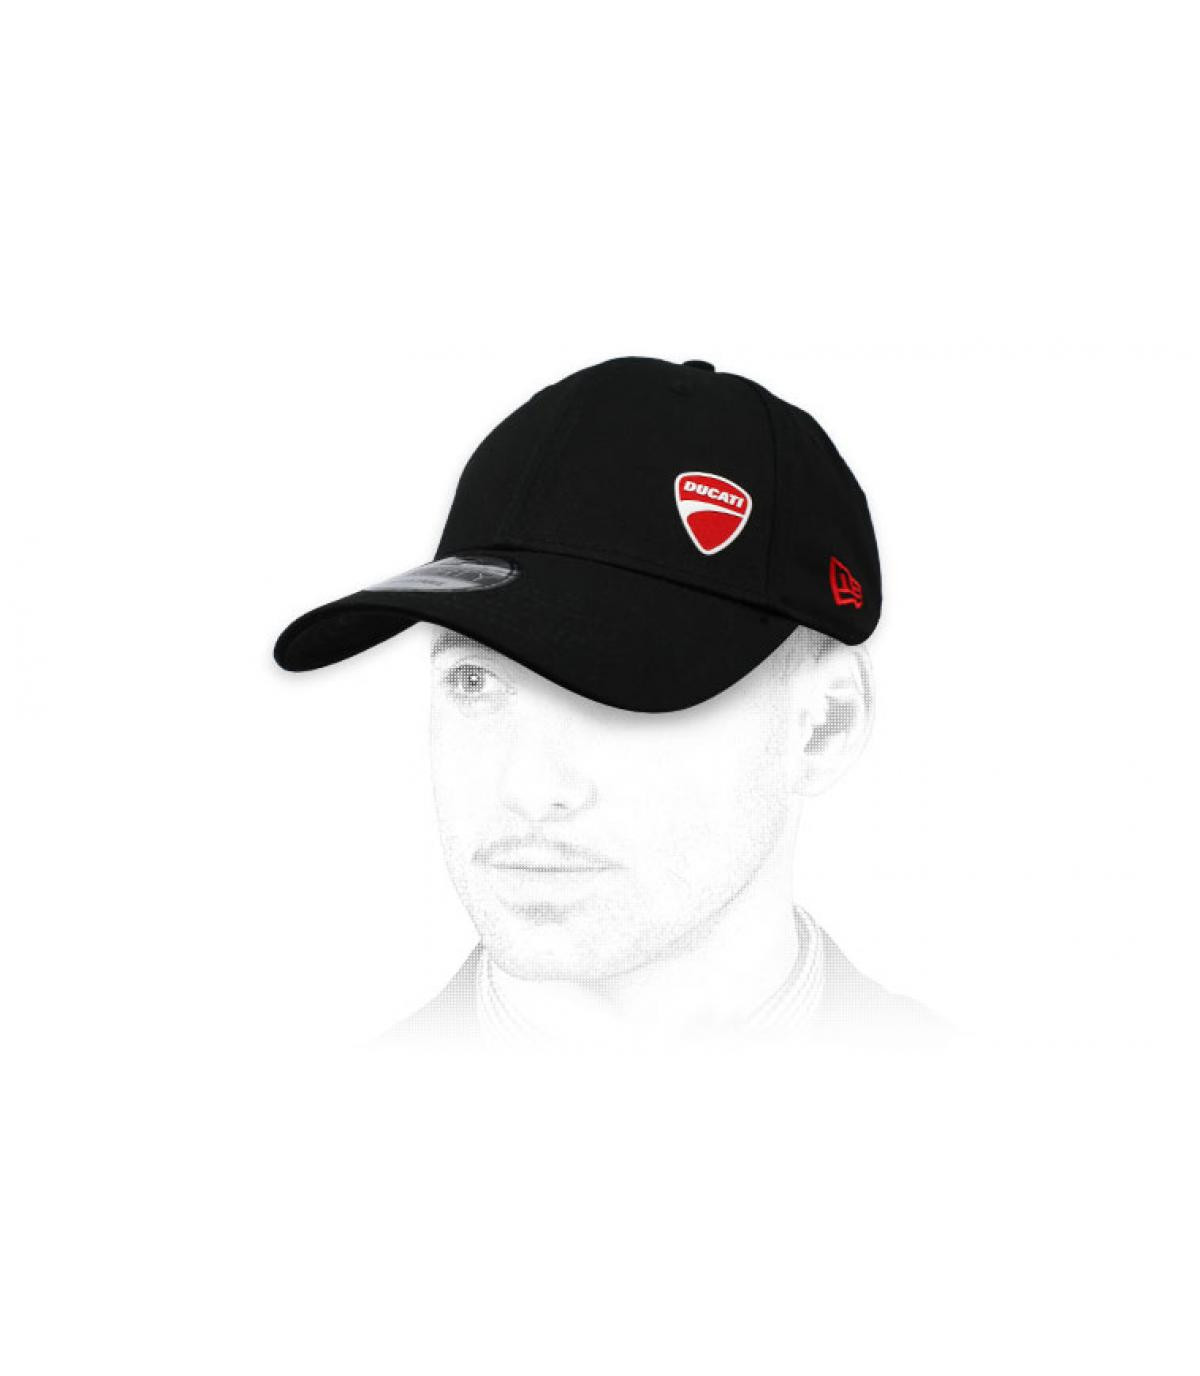 zwarte Ducati cap